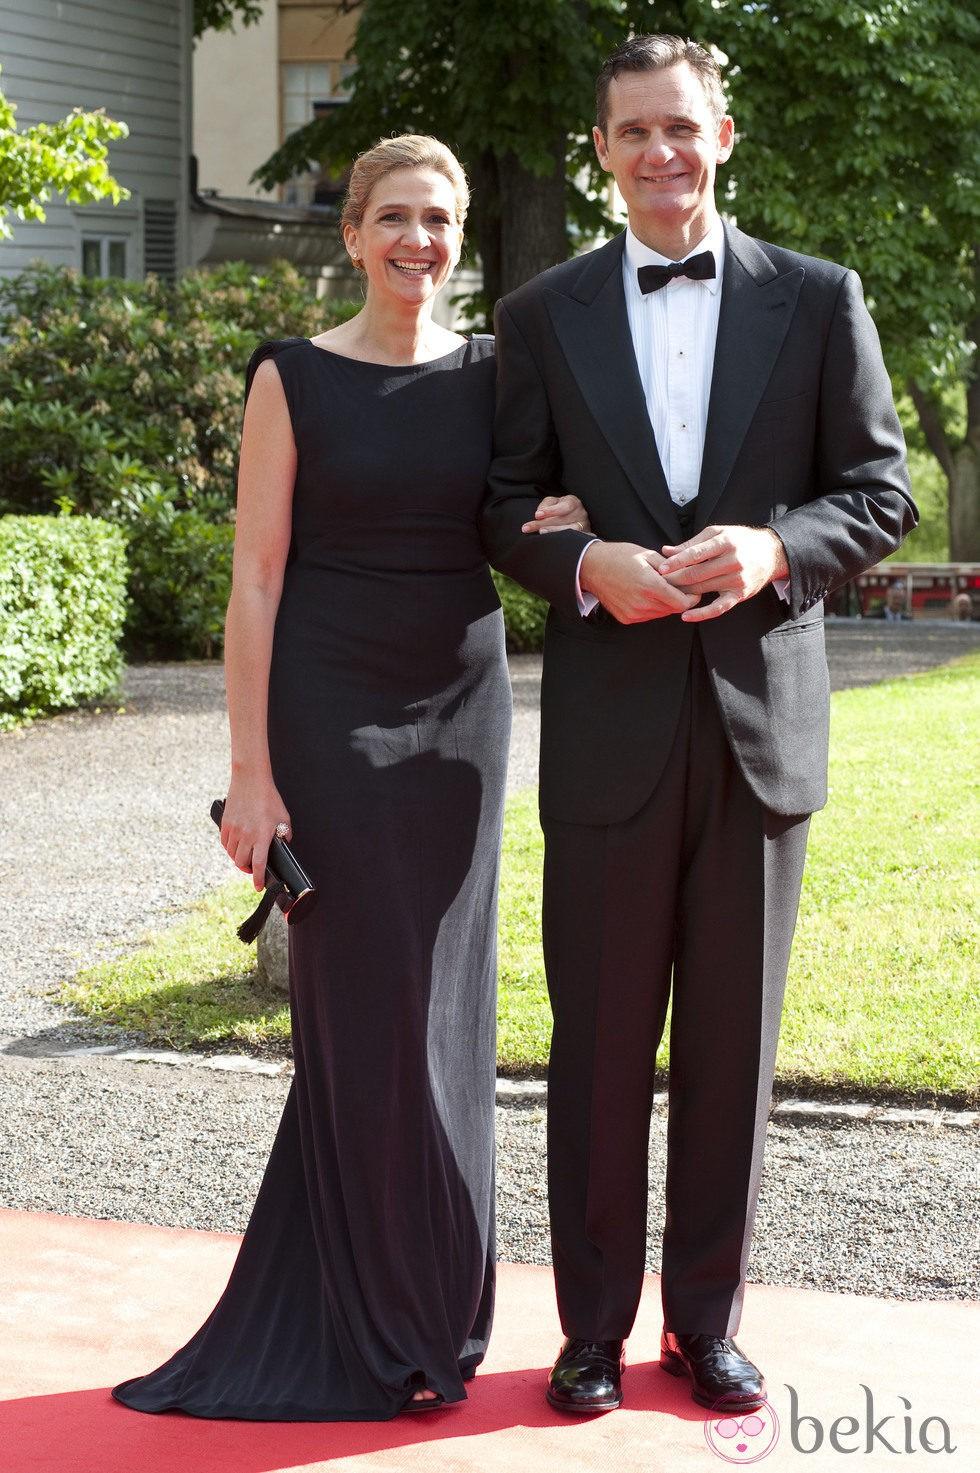 La Infanta Cristina e Iñaki Urdangarín